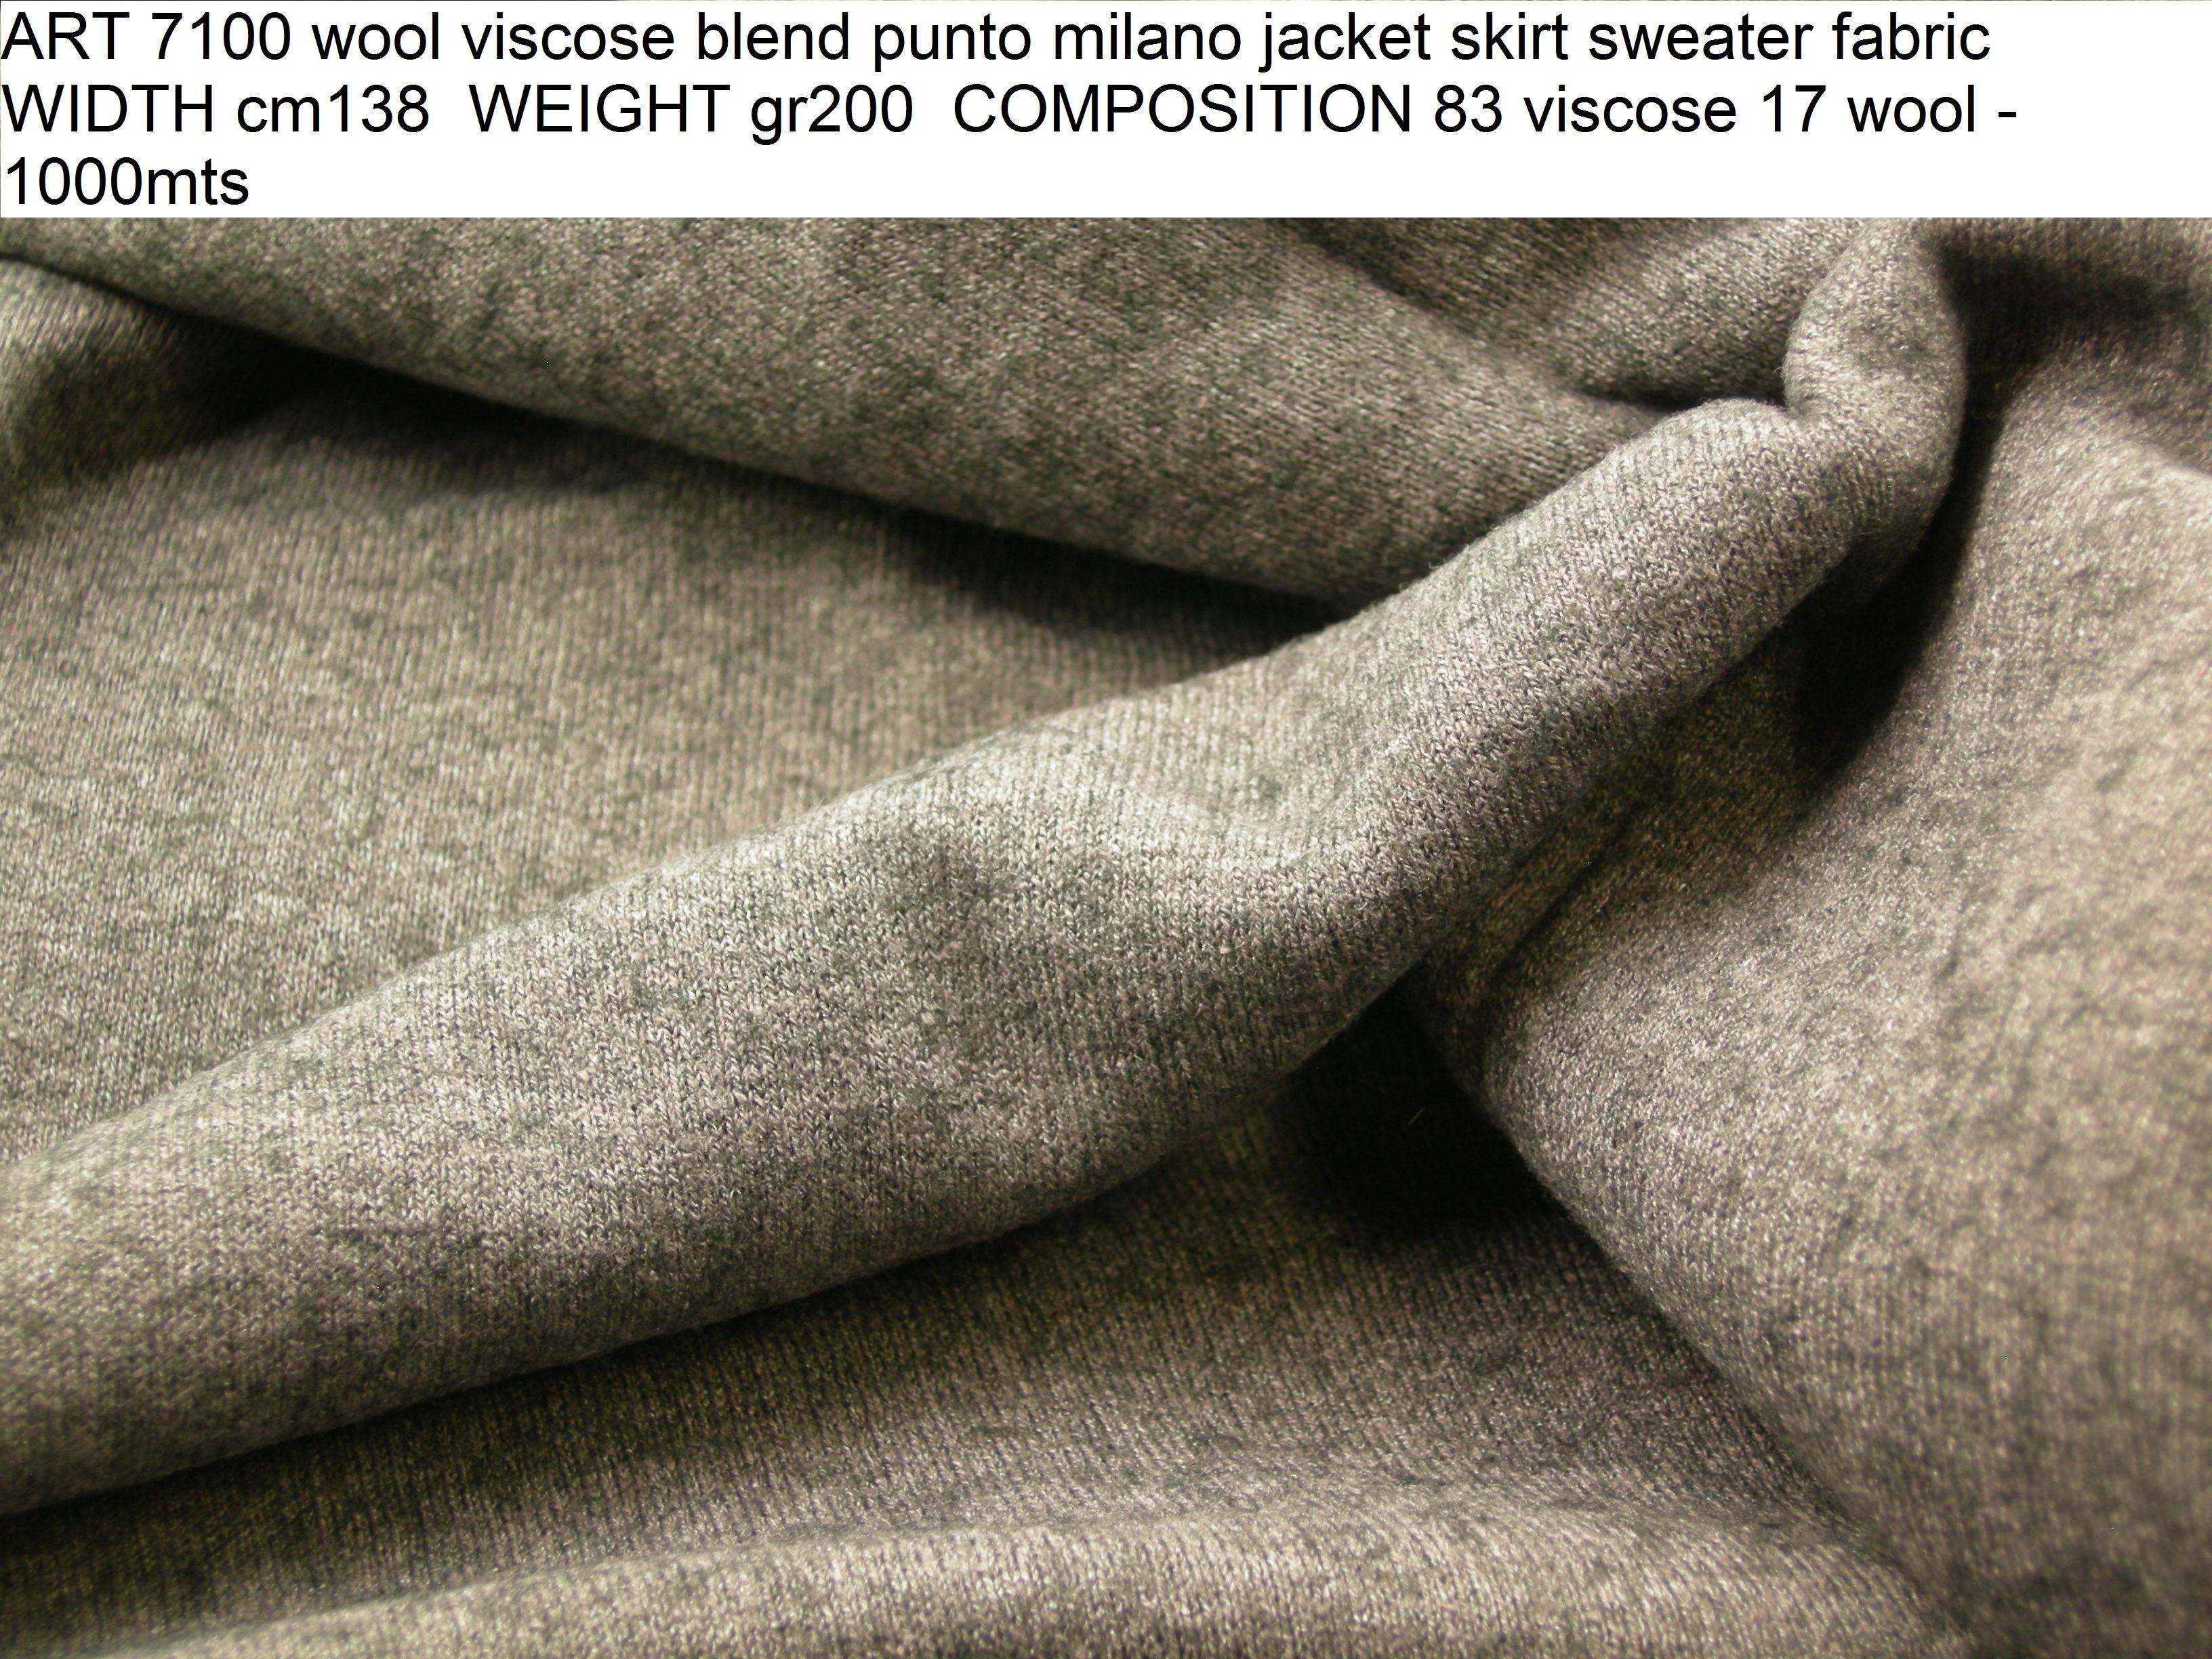 ART 7100 wool viscose blend punto milano jacket skirt sweater fabric WIDTH cm138 WEIGHT gr200 COMPOSITION 83 viscose 17 wool - 1000mts